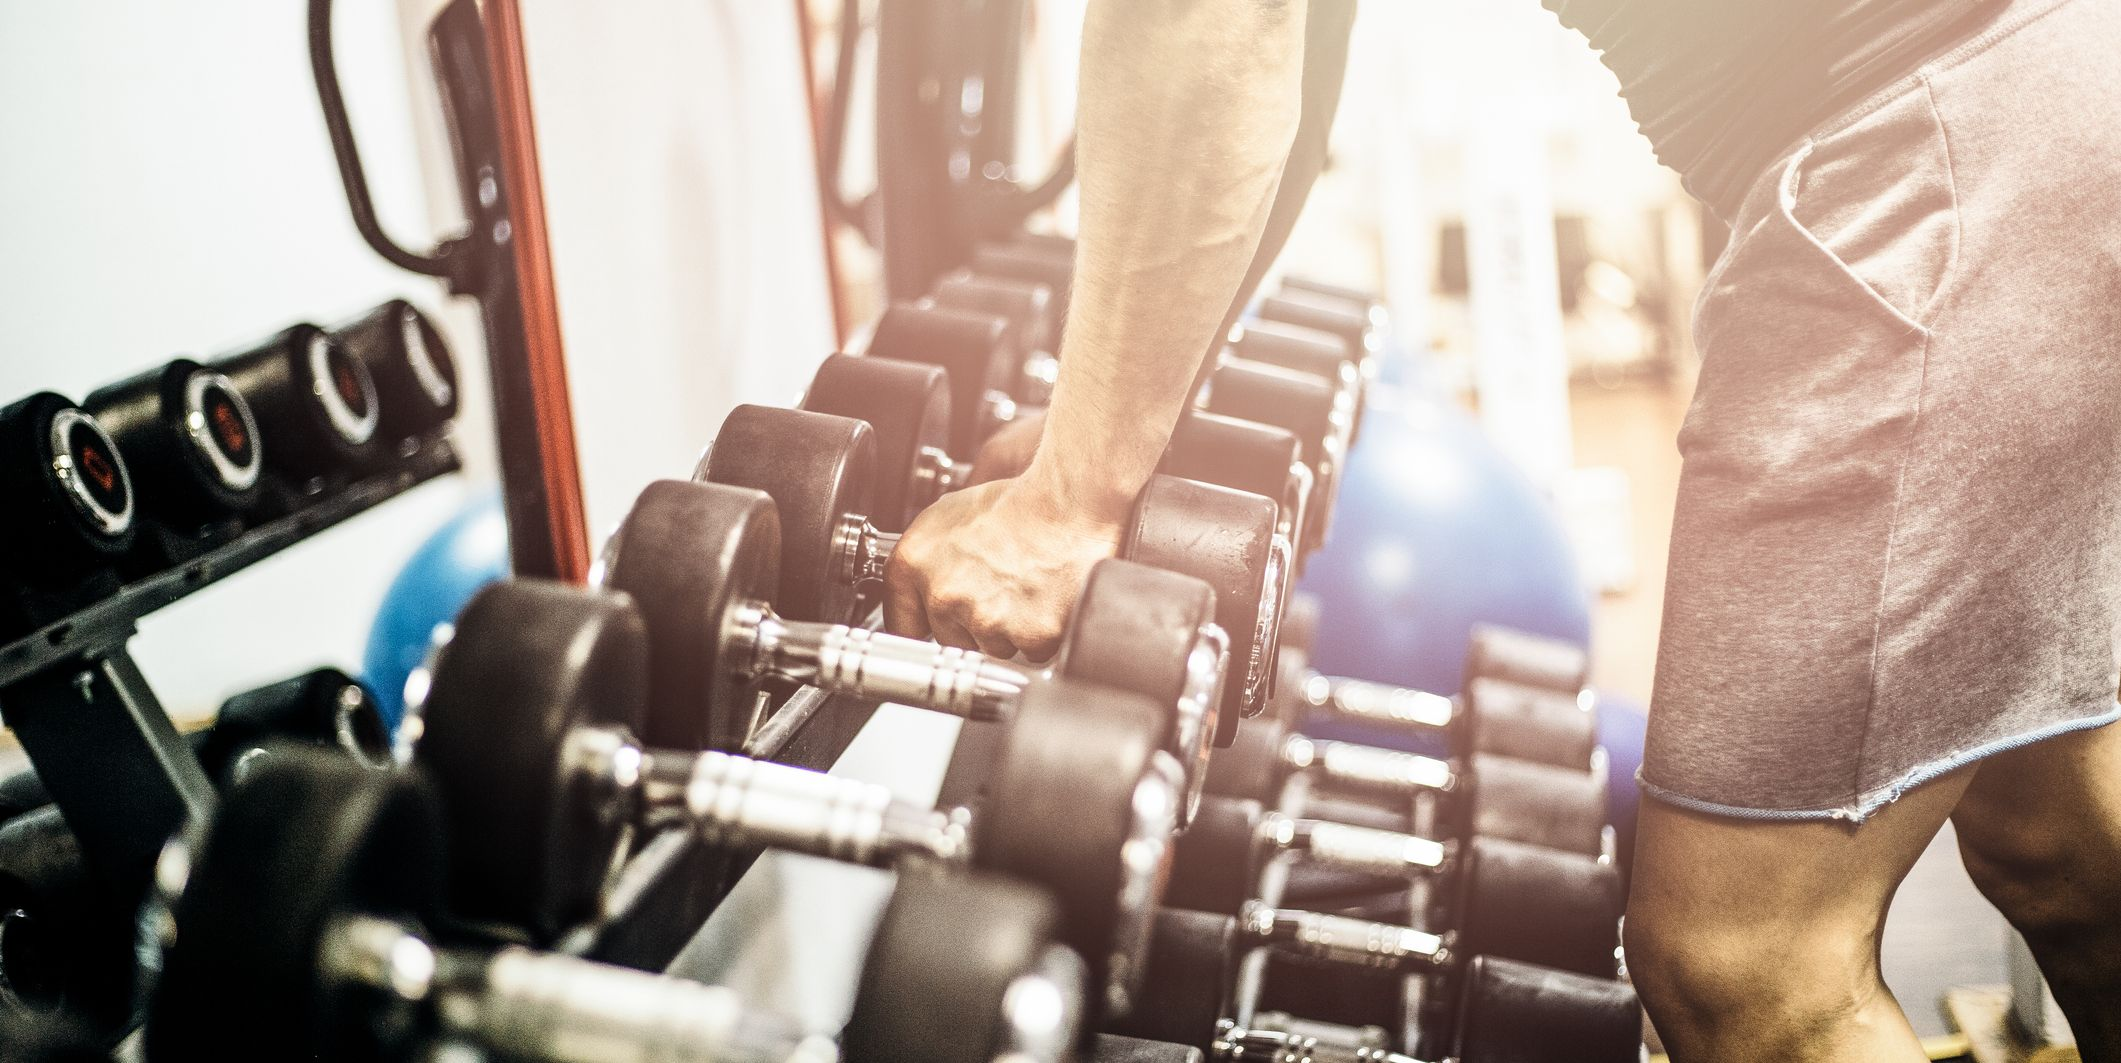 Man holding dumbbell in gym